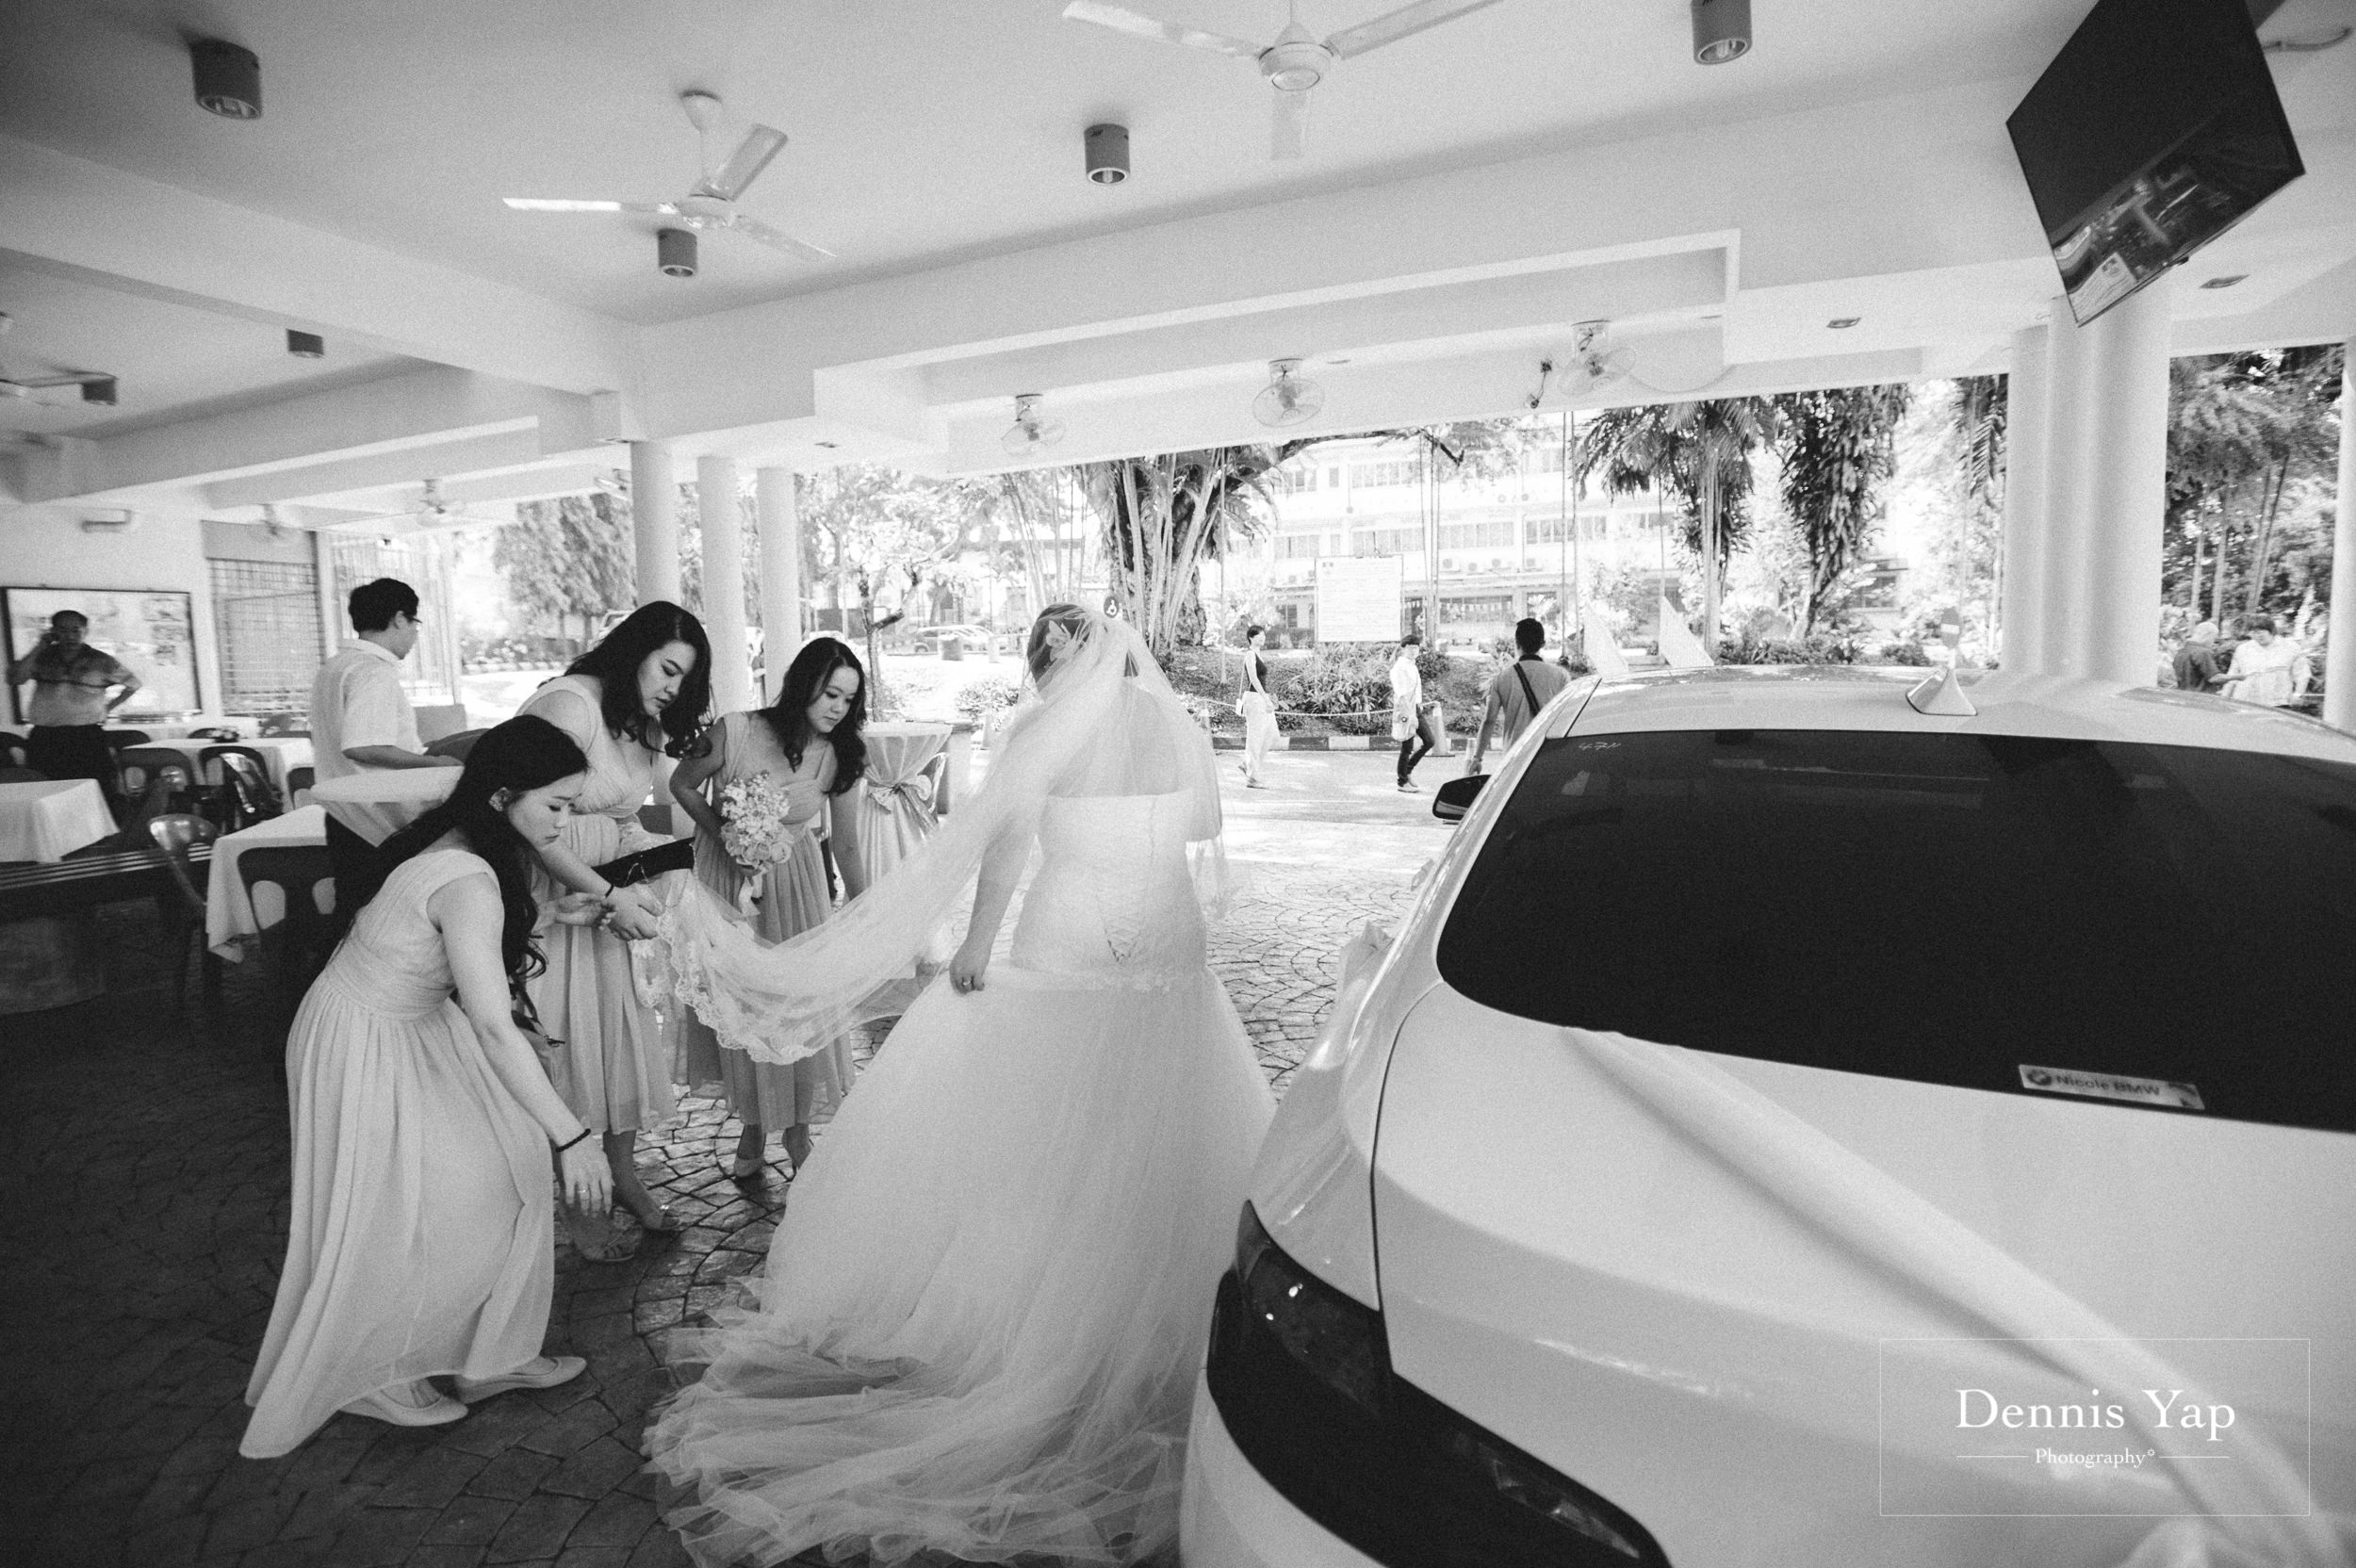 jinhan jacqui church wedding xavier catholic dennis yap photography malaysia wedding photographer-11.jpg